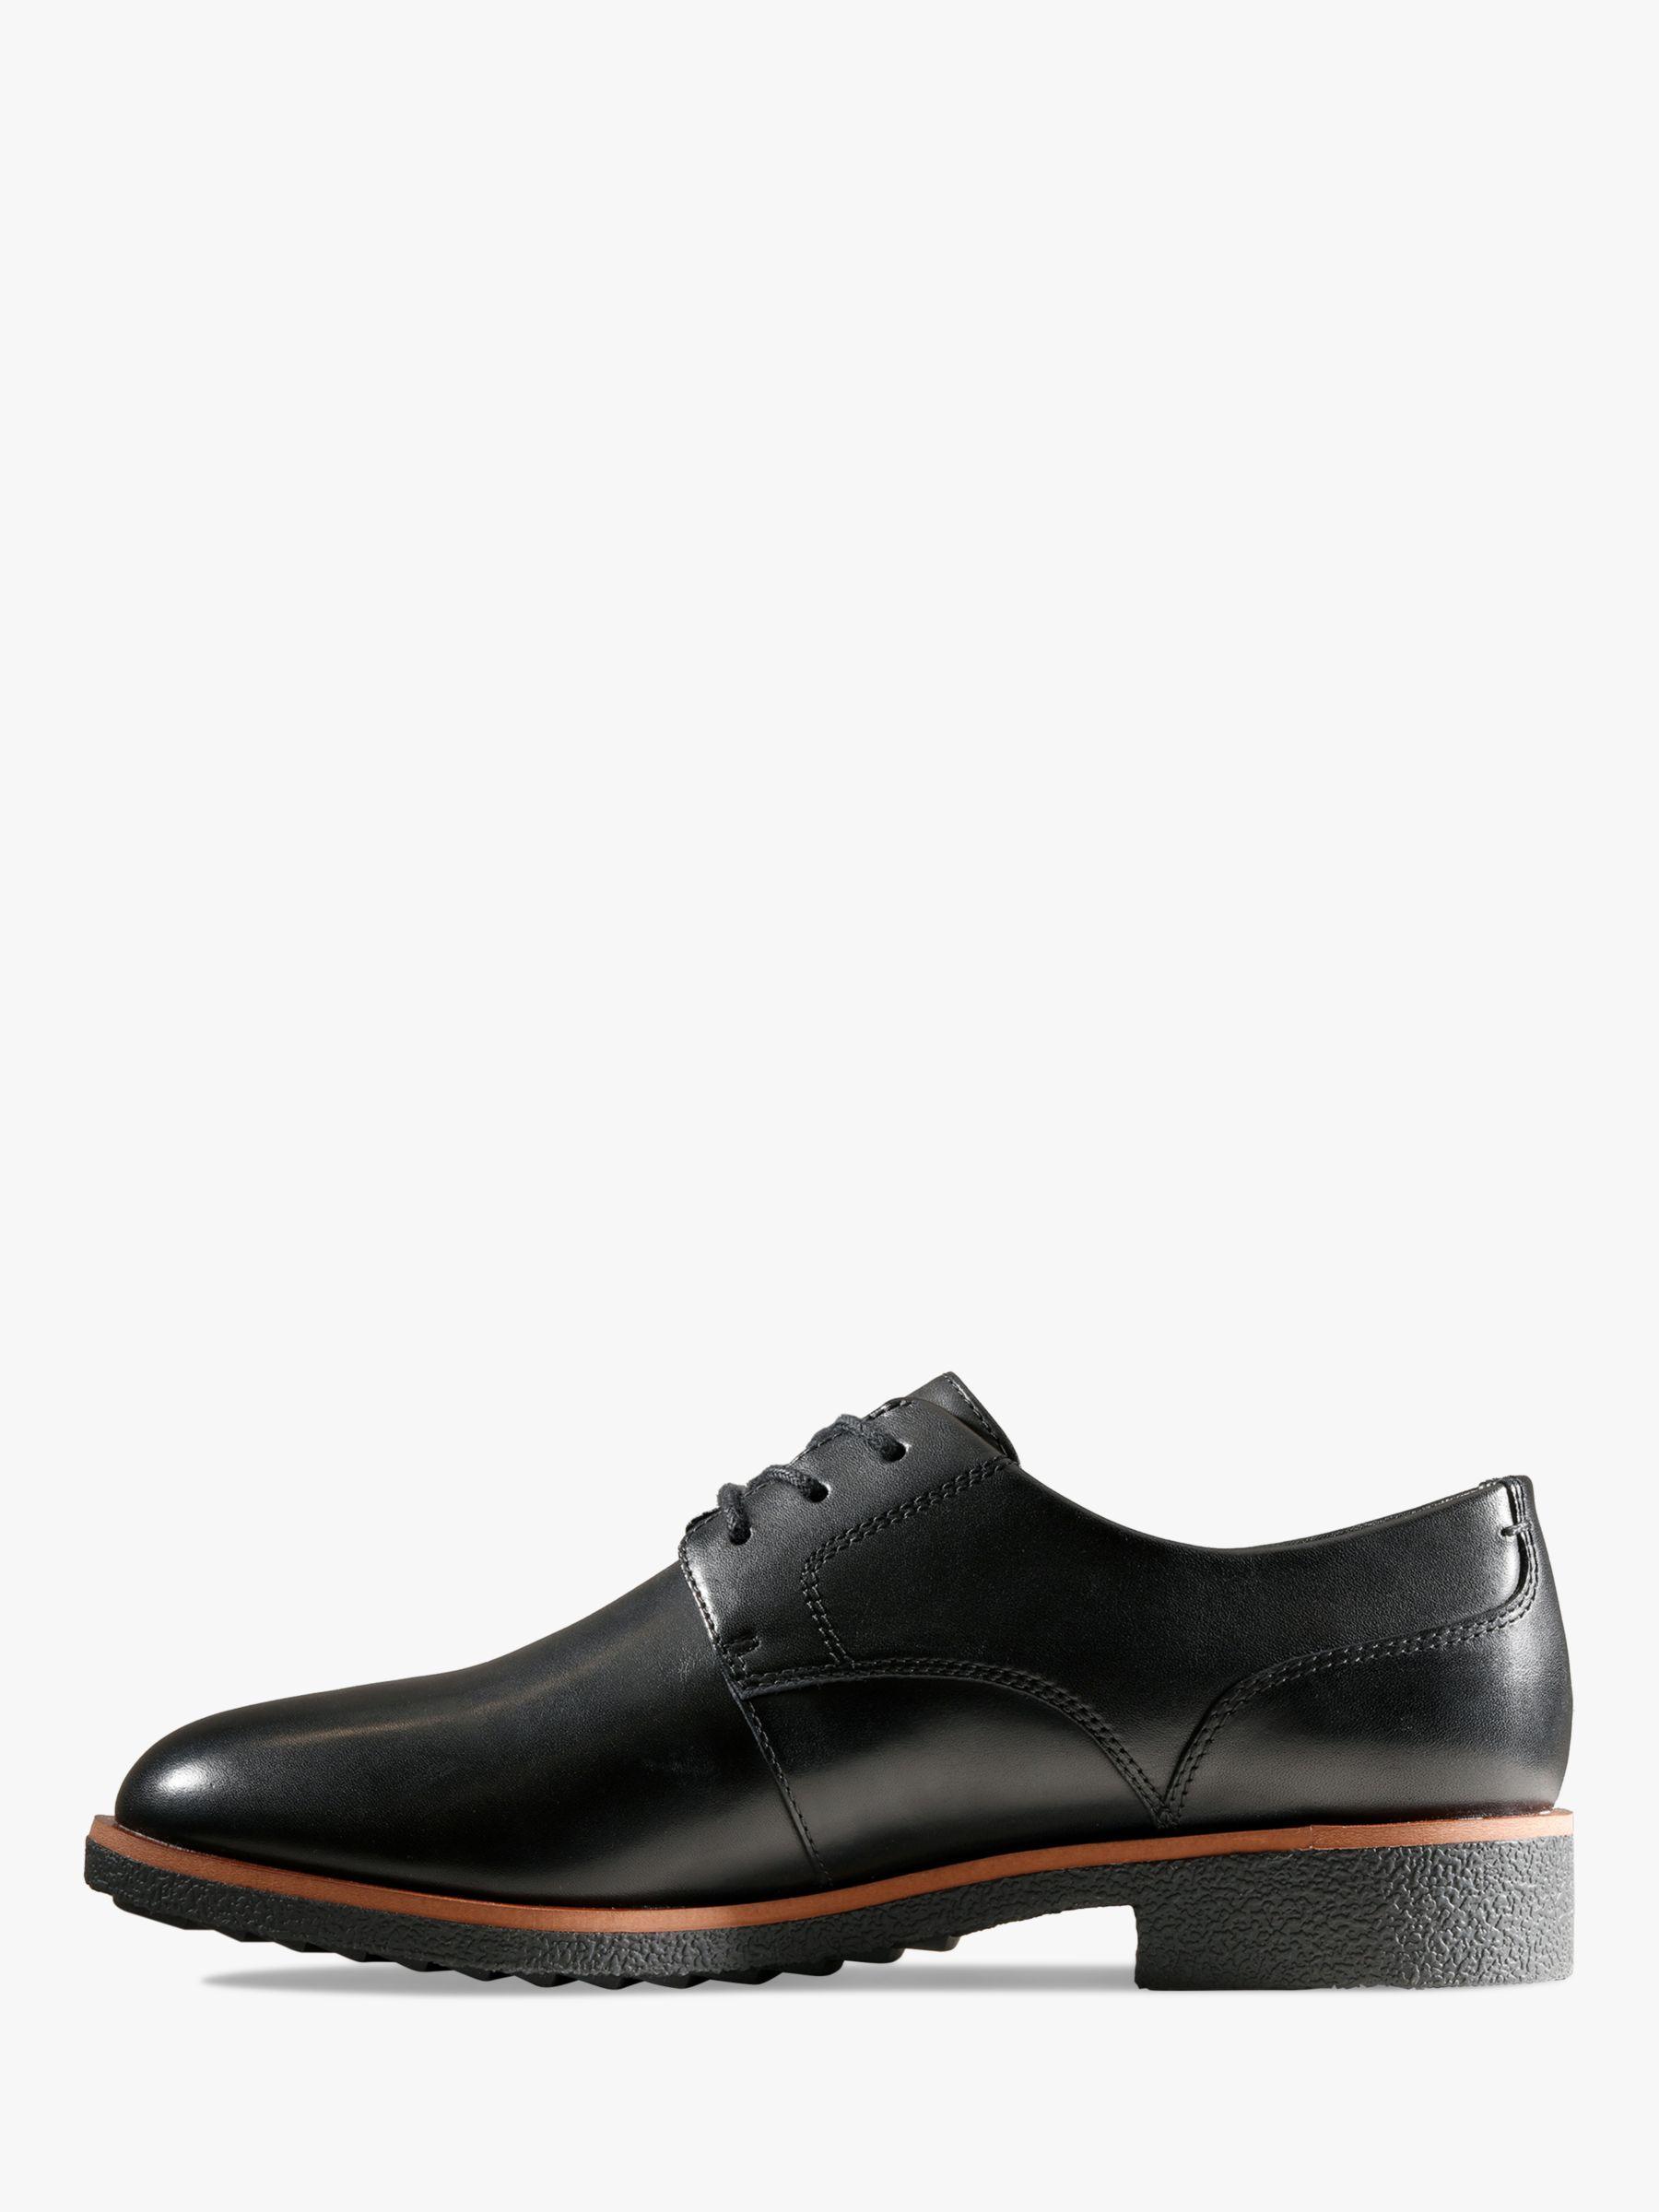 Clarks Griffin Lane Leather Brogues, Black | Clark heels